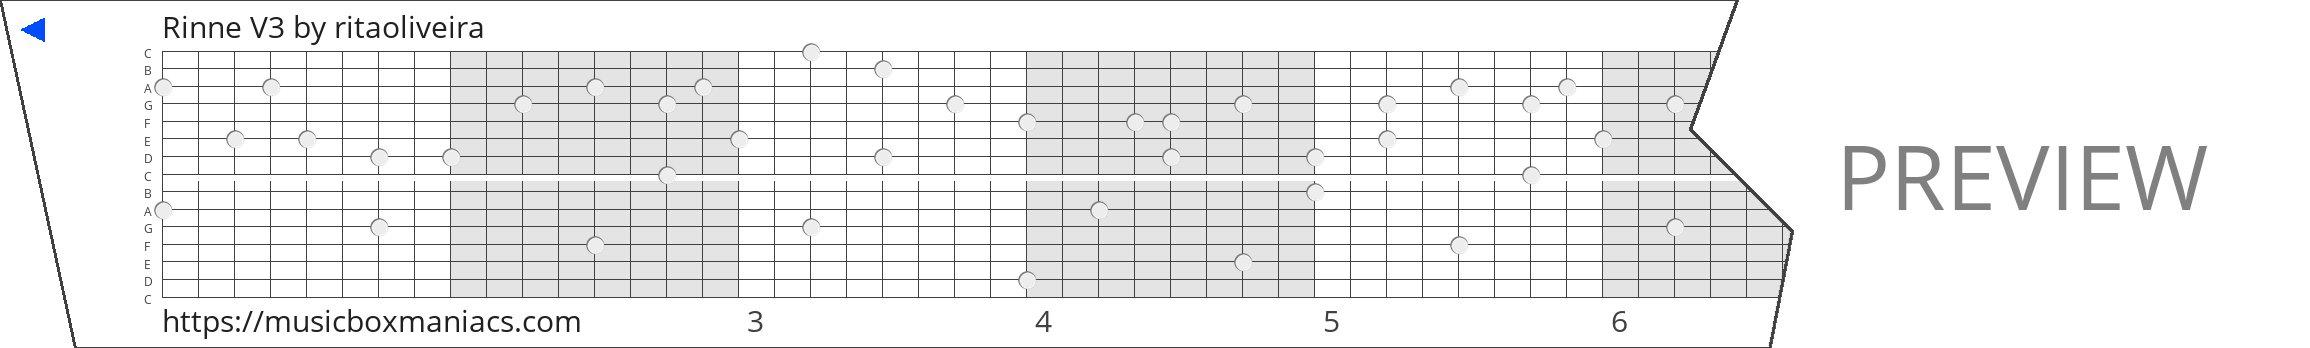 Rinne V3 15 note music box paper strip